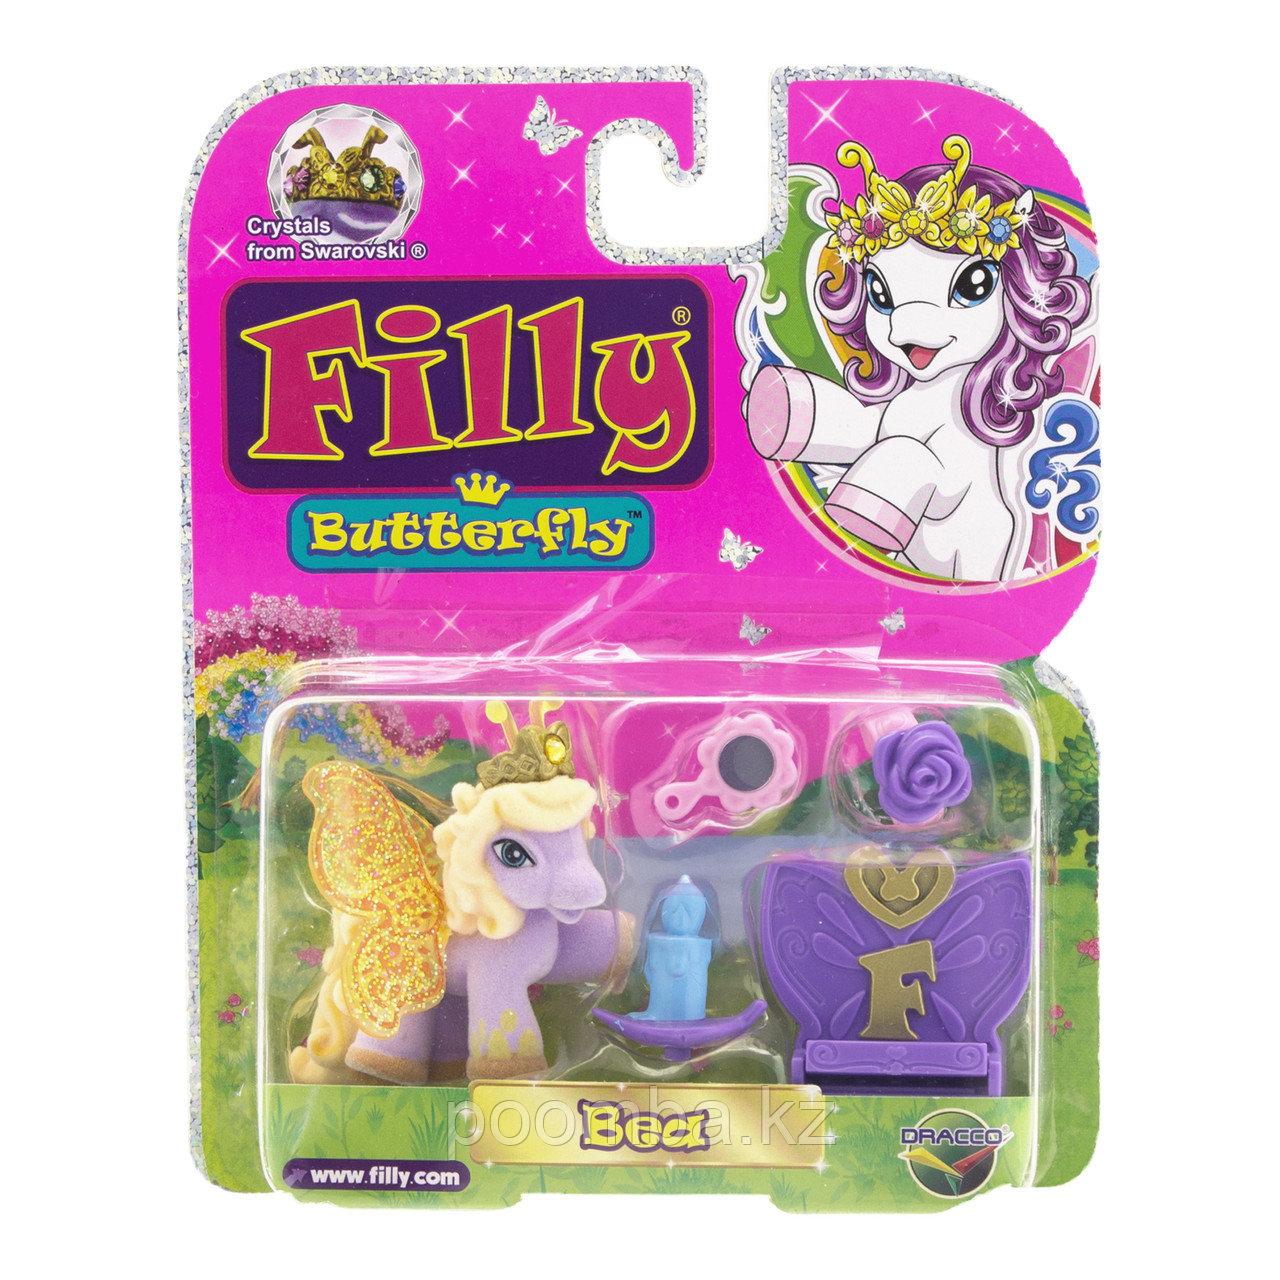 "Игровой набор Filly""Butterfly Glitter""с аксессуарами -Bea"